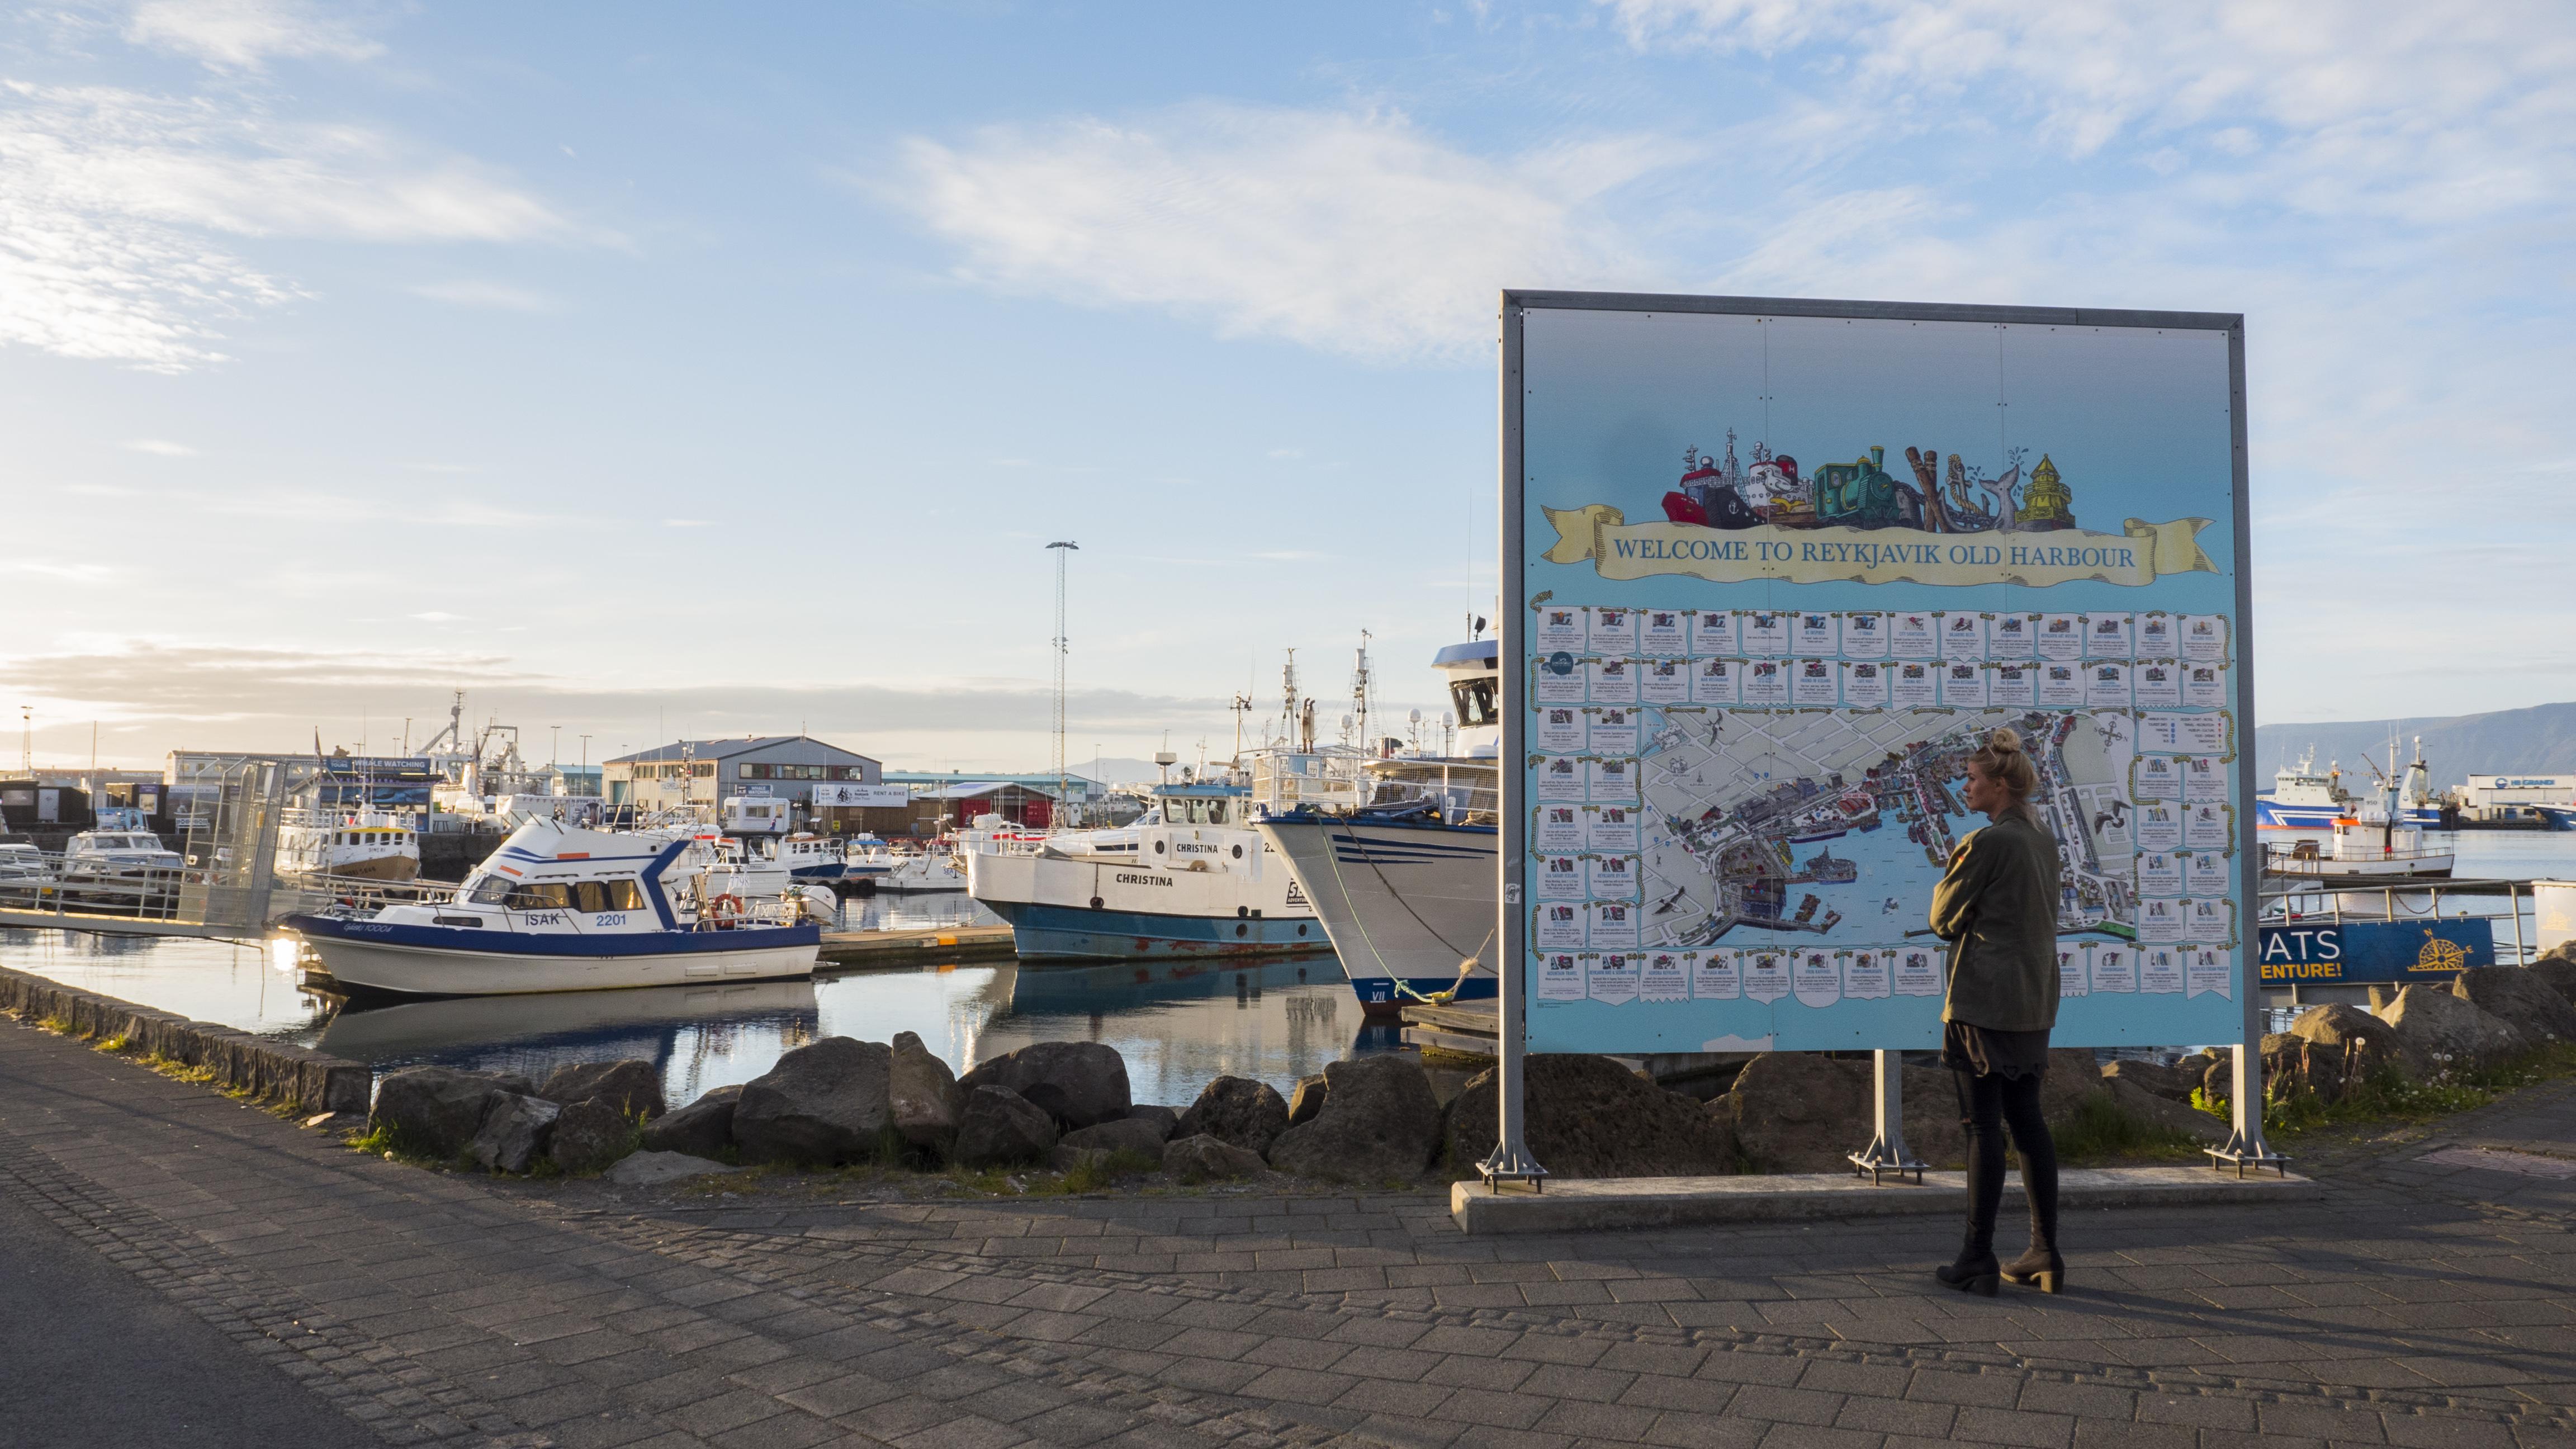 Grandi is a harbour district in the heart of Reykjavík.